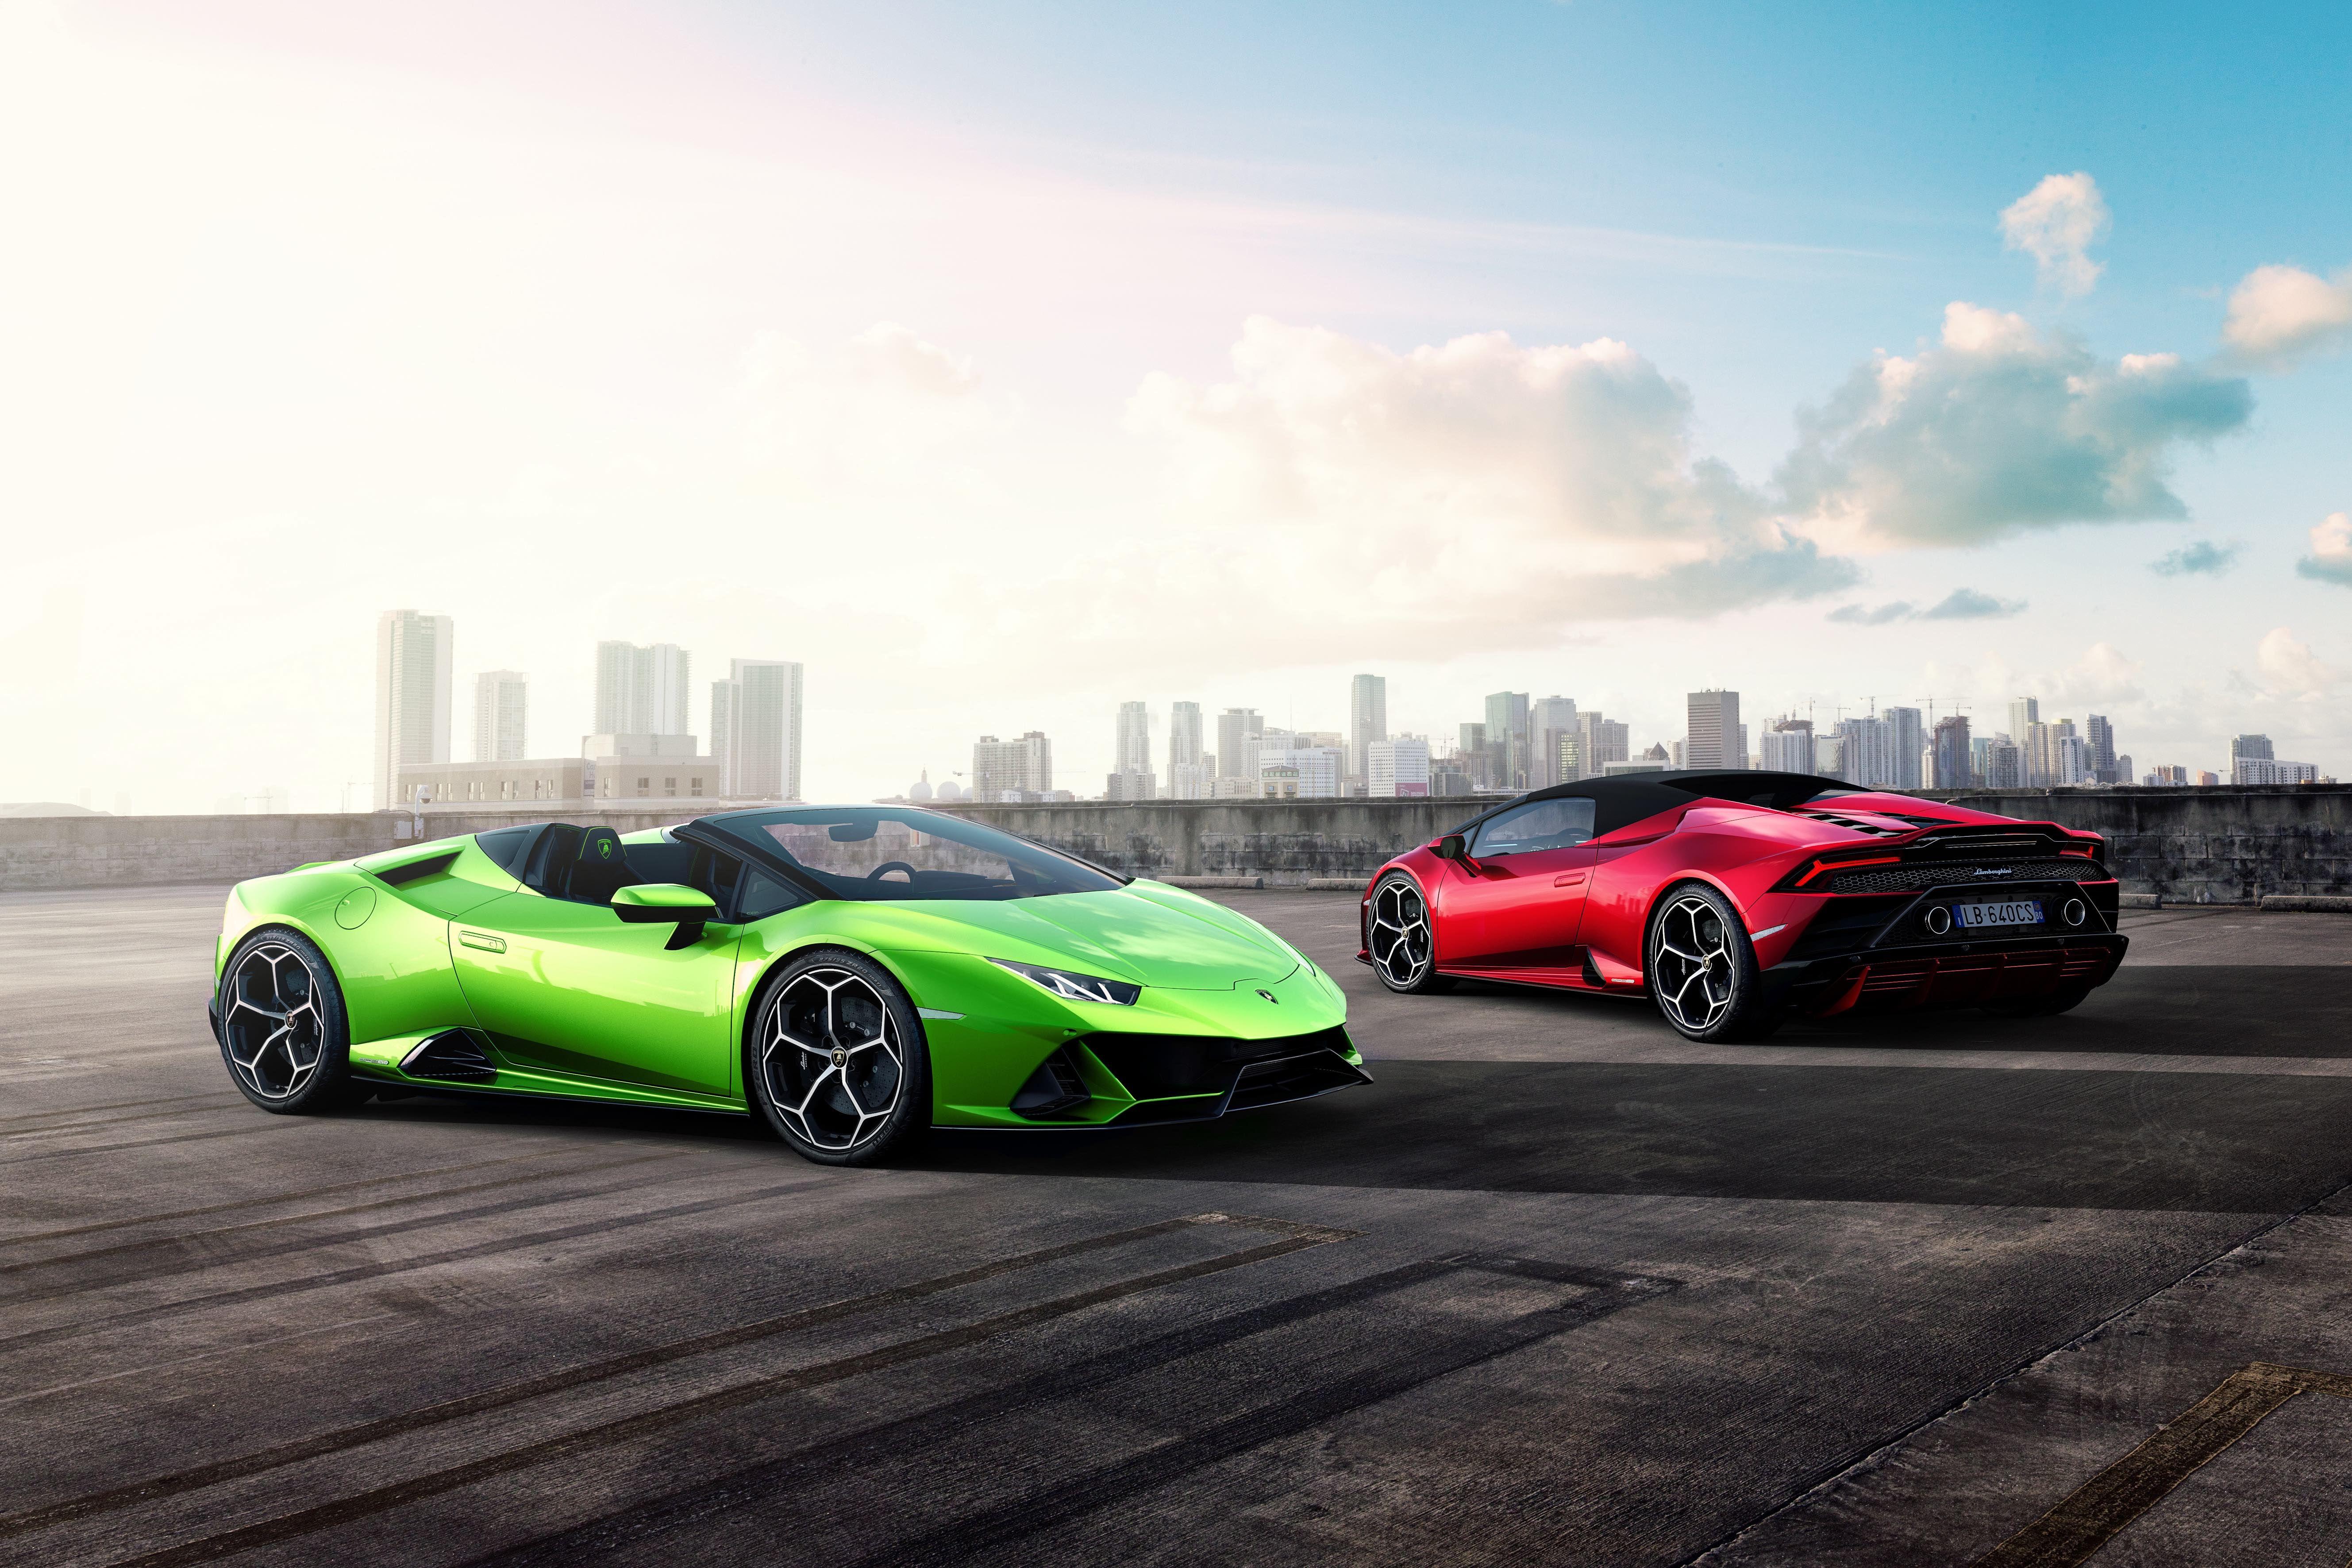 Lamborghini Huracán Evo Spyder \u2013 Open,Air Fun and 202 MPH